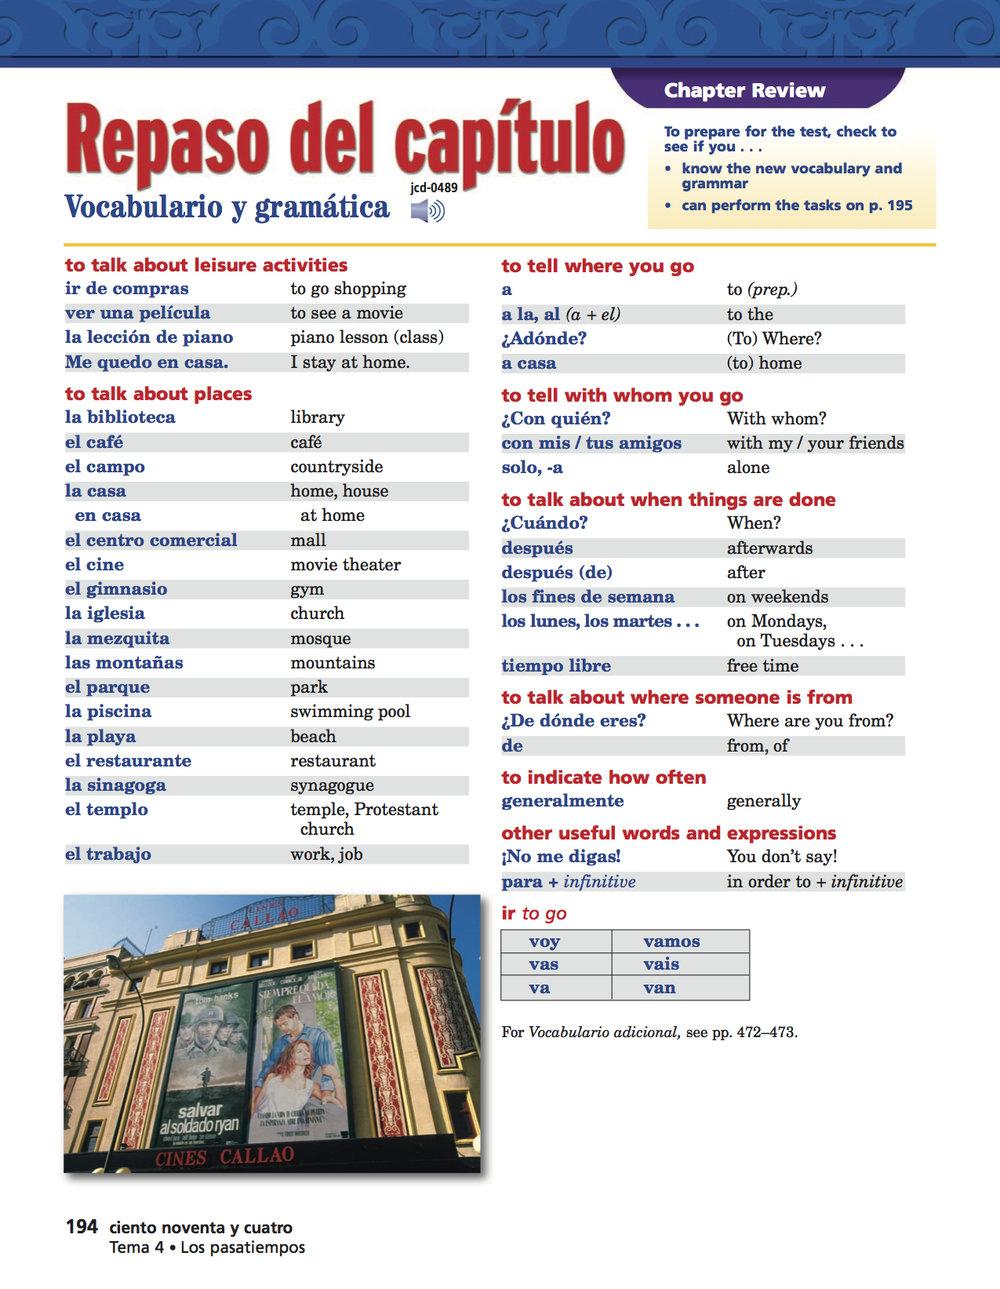 L1_Capitulo_4A copia.jpg